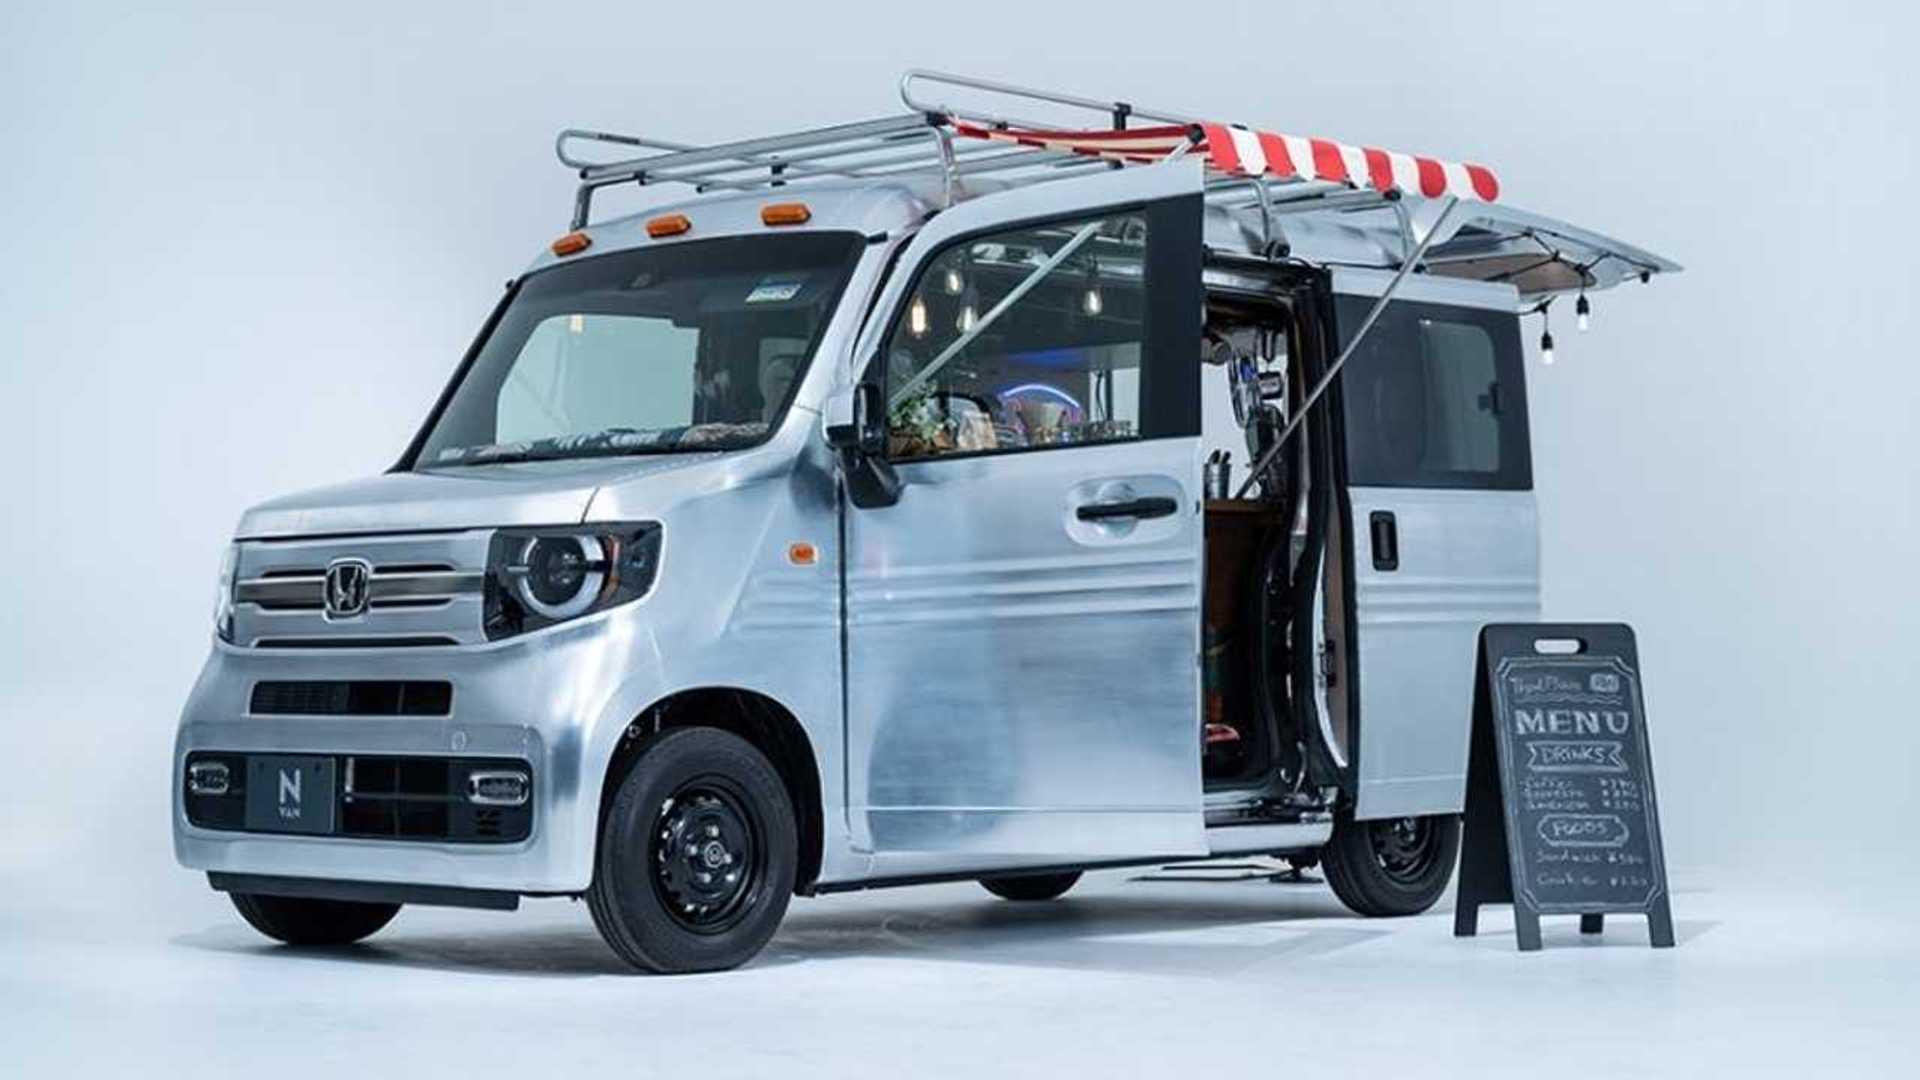 Мобильное кафе Honda N-Van, дебют Rugged Fit на Токийском автосалоне 2021 года